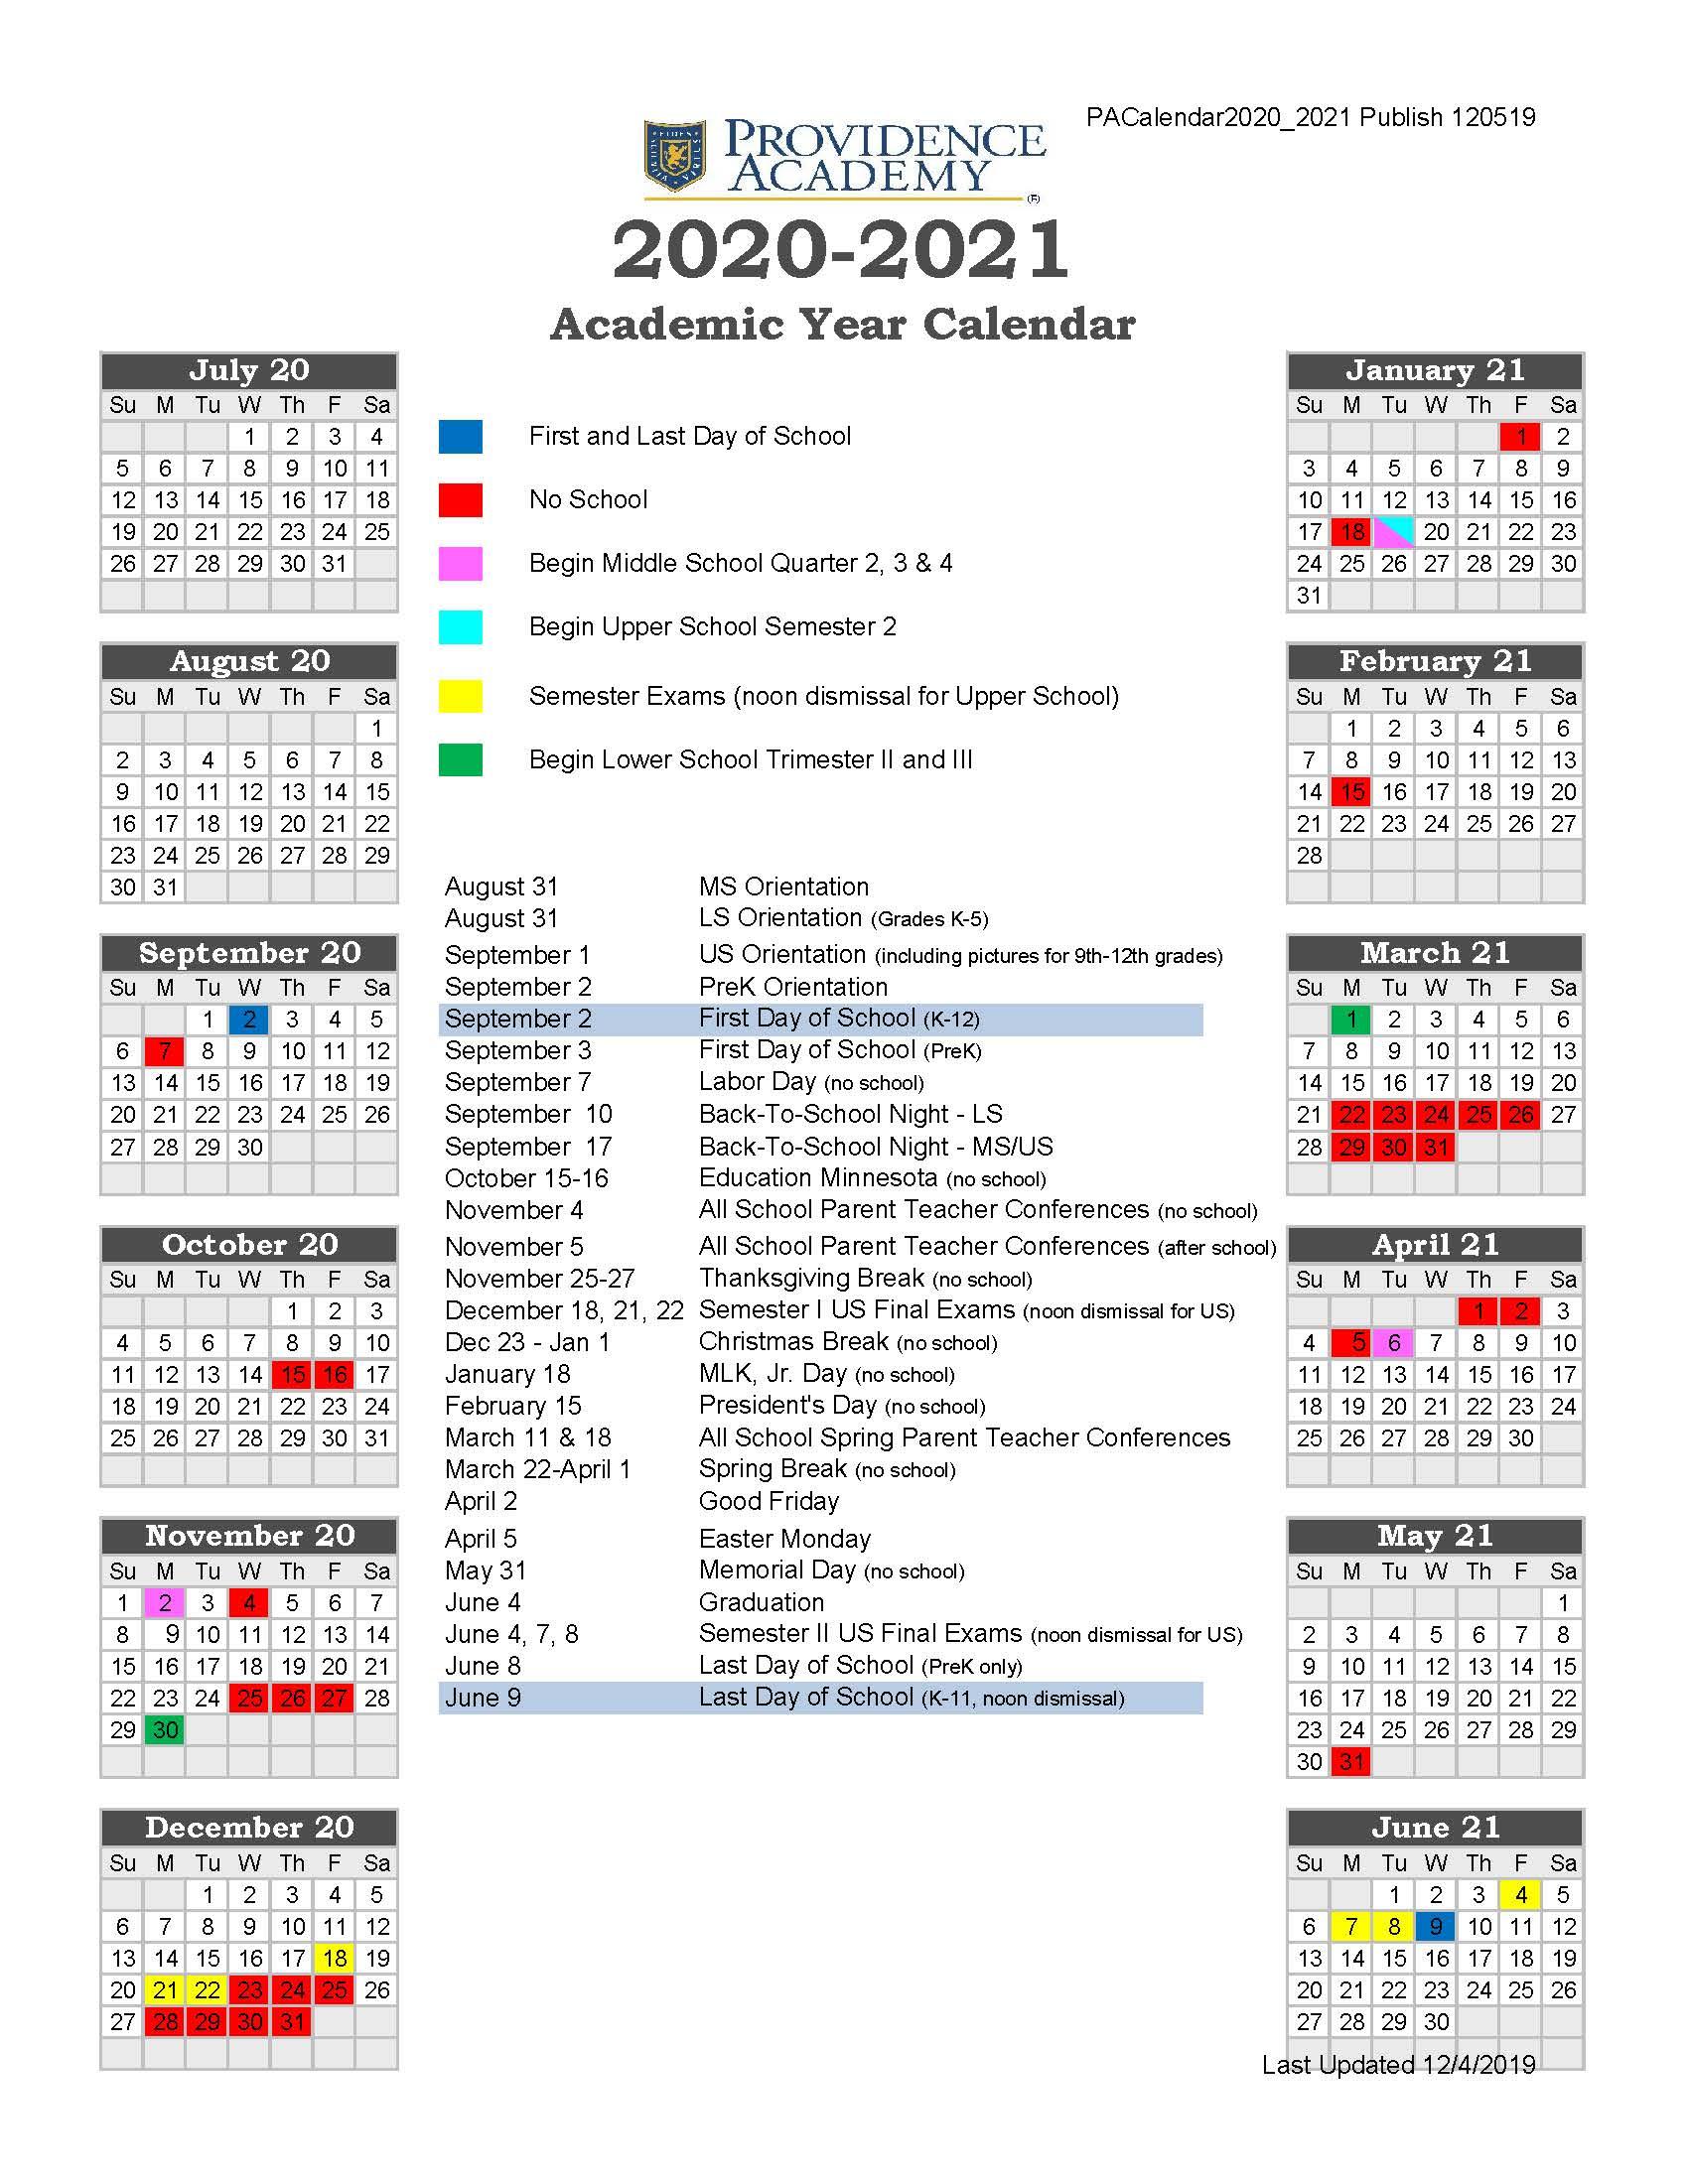 19-20_Providence-Academy-Academic-Calendar-2020-2021 regarding White Bear Lake Schools Activites Calendar 2021 2021